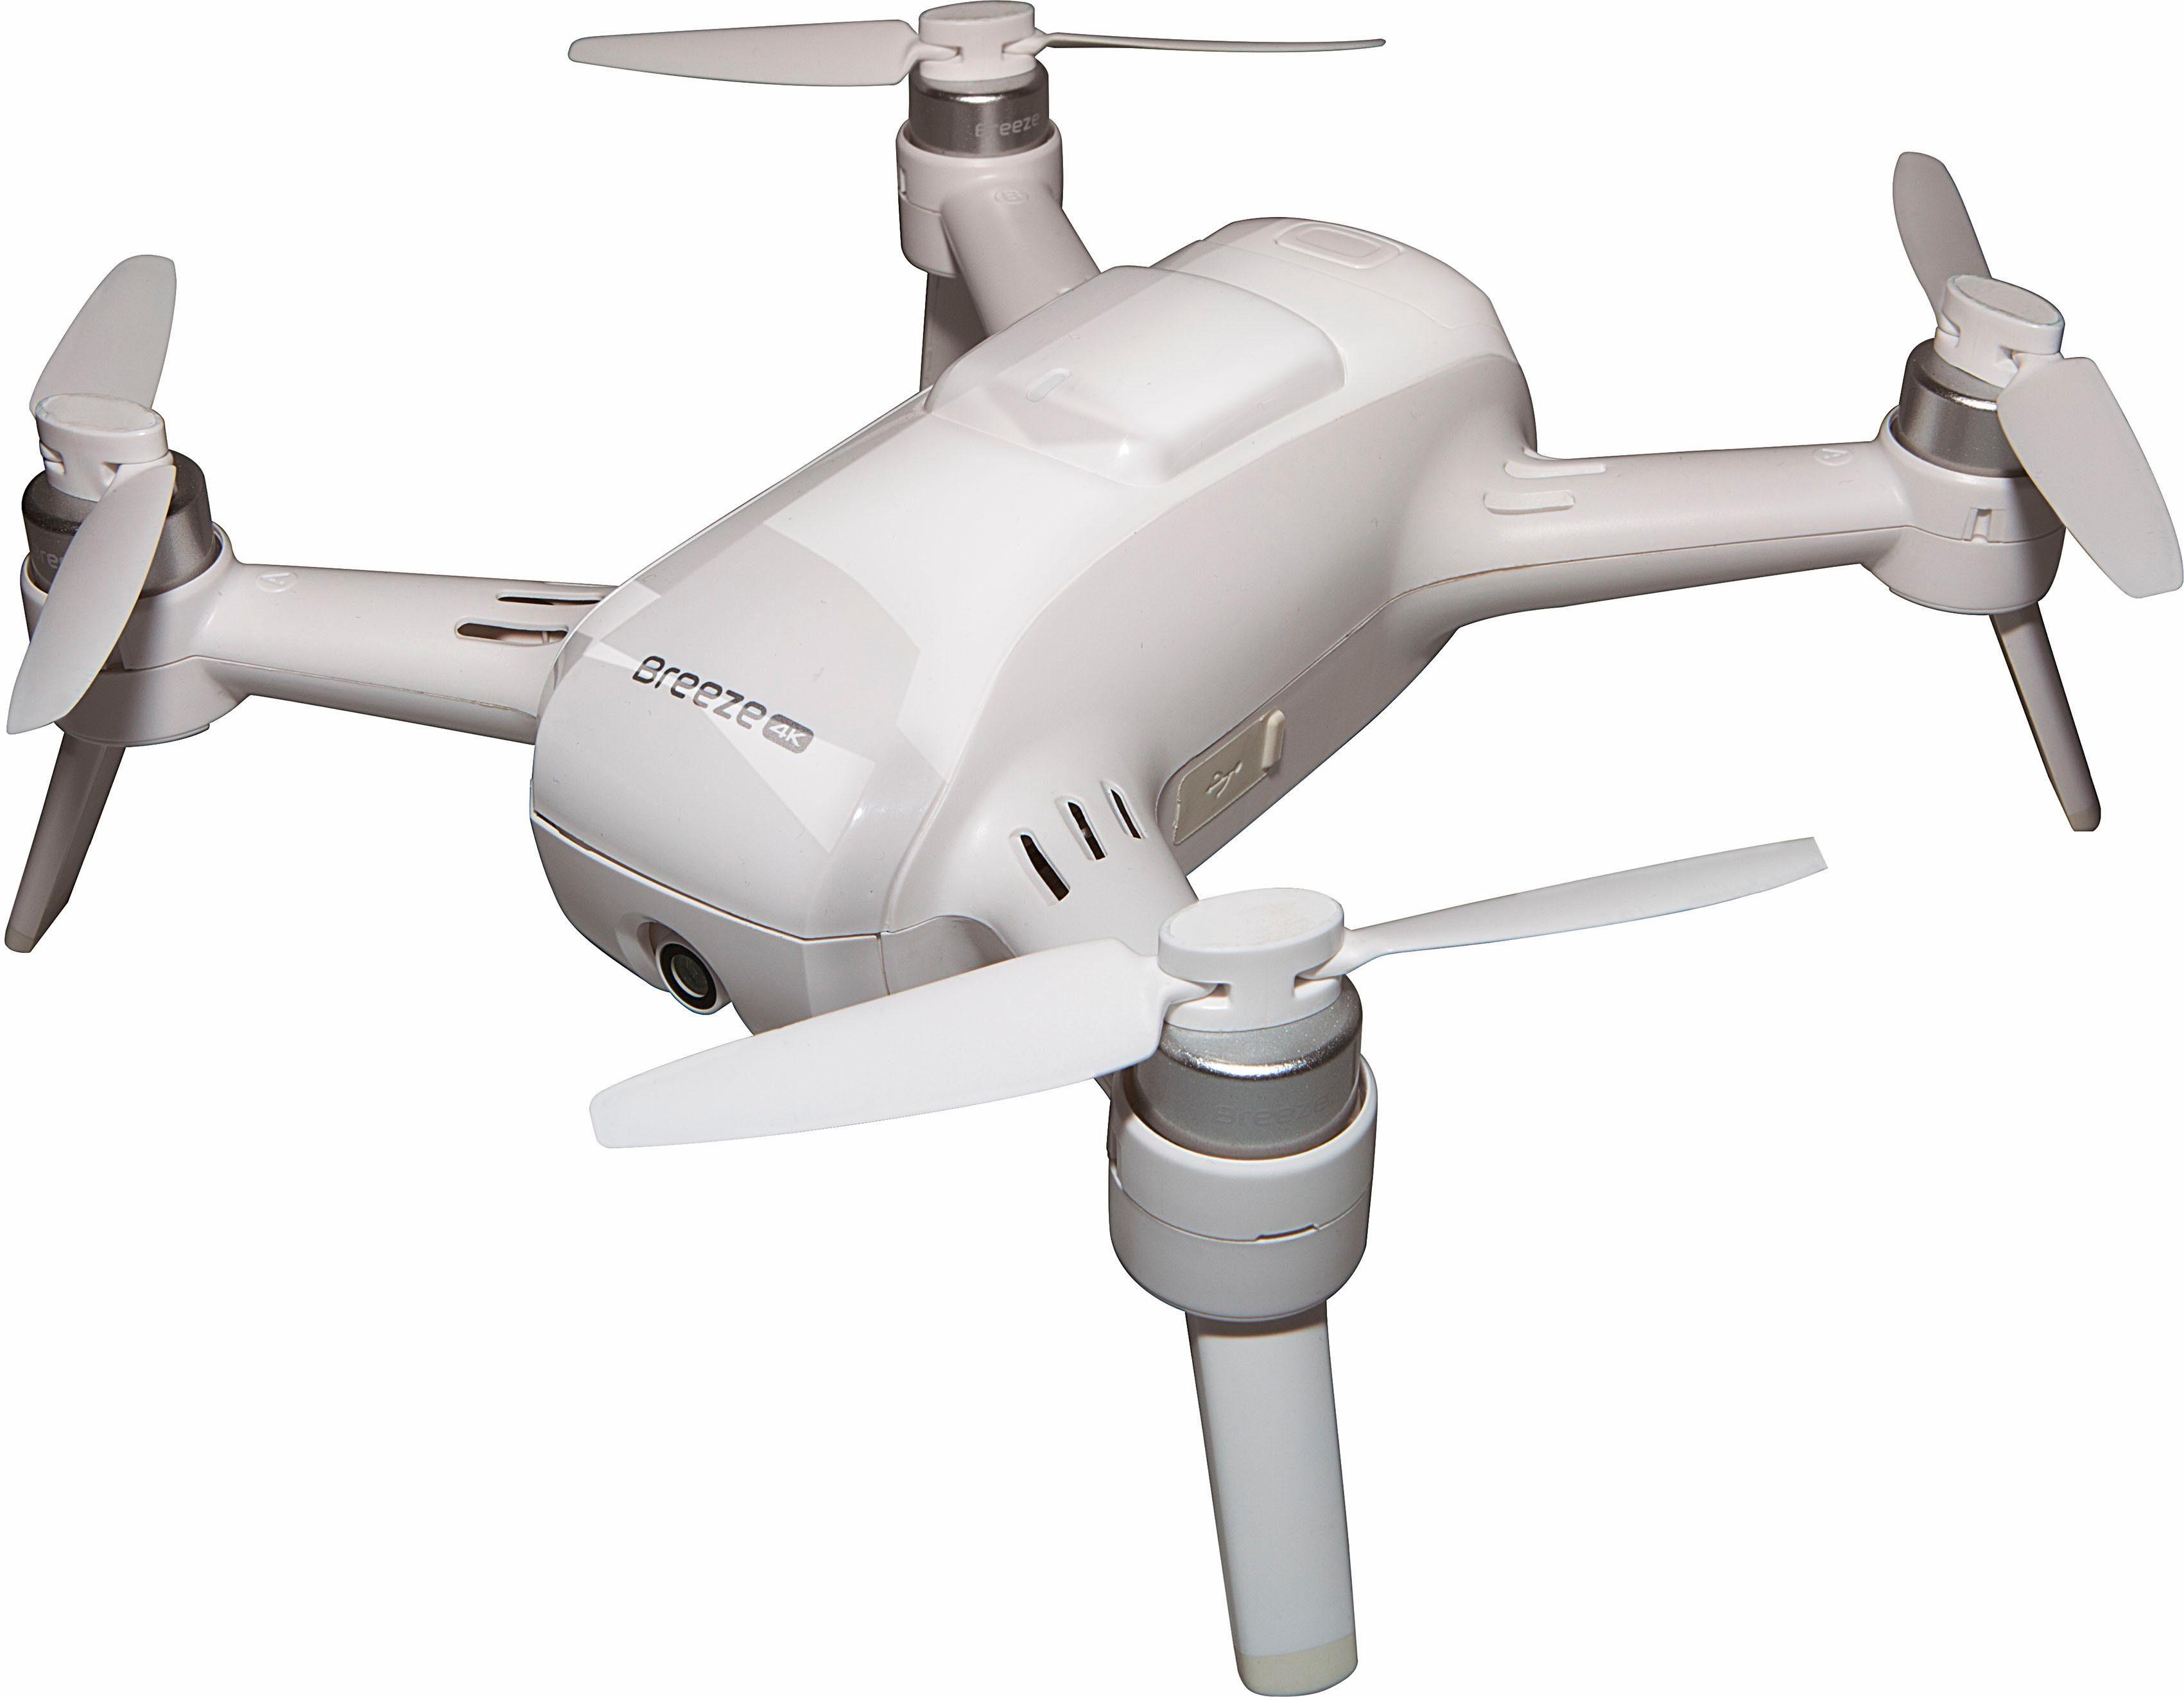 Yuneec Breeze Drohnen mit 4K-UHD-Kamera, inkl. FPV Headset & Controller Kit